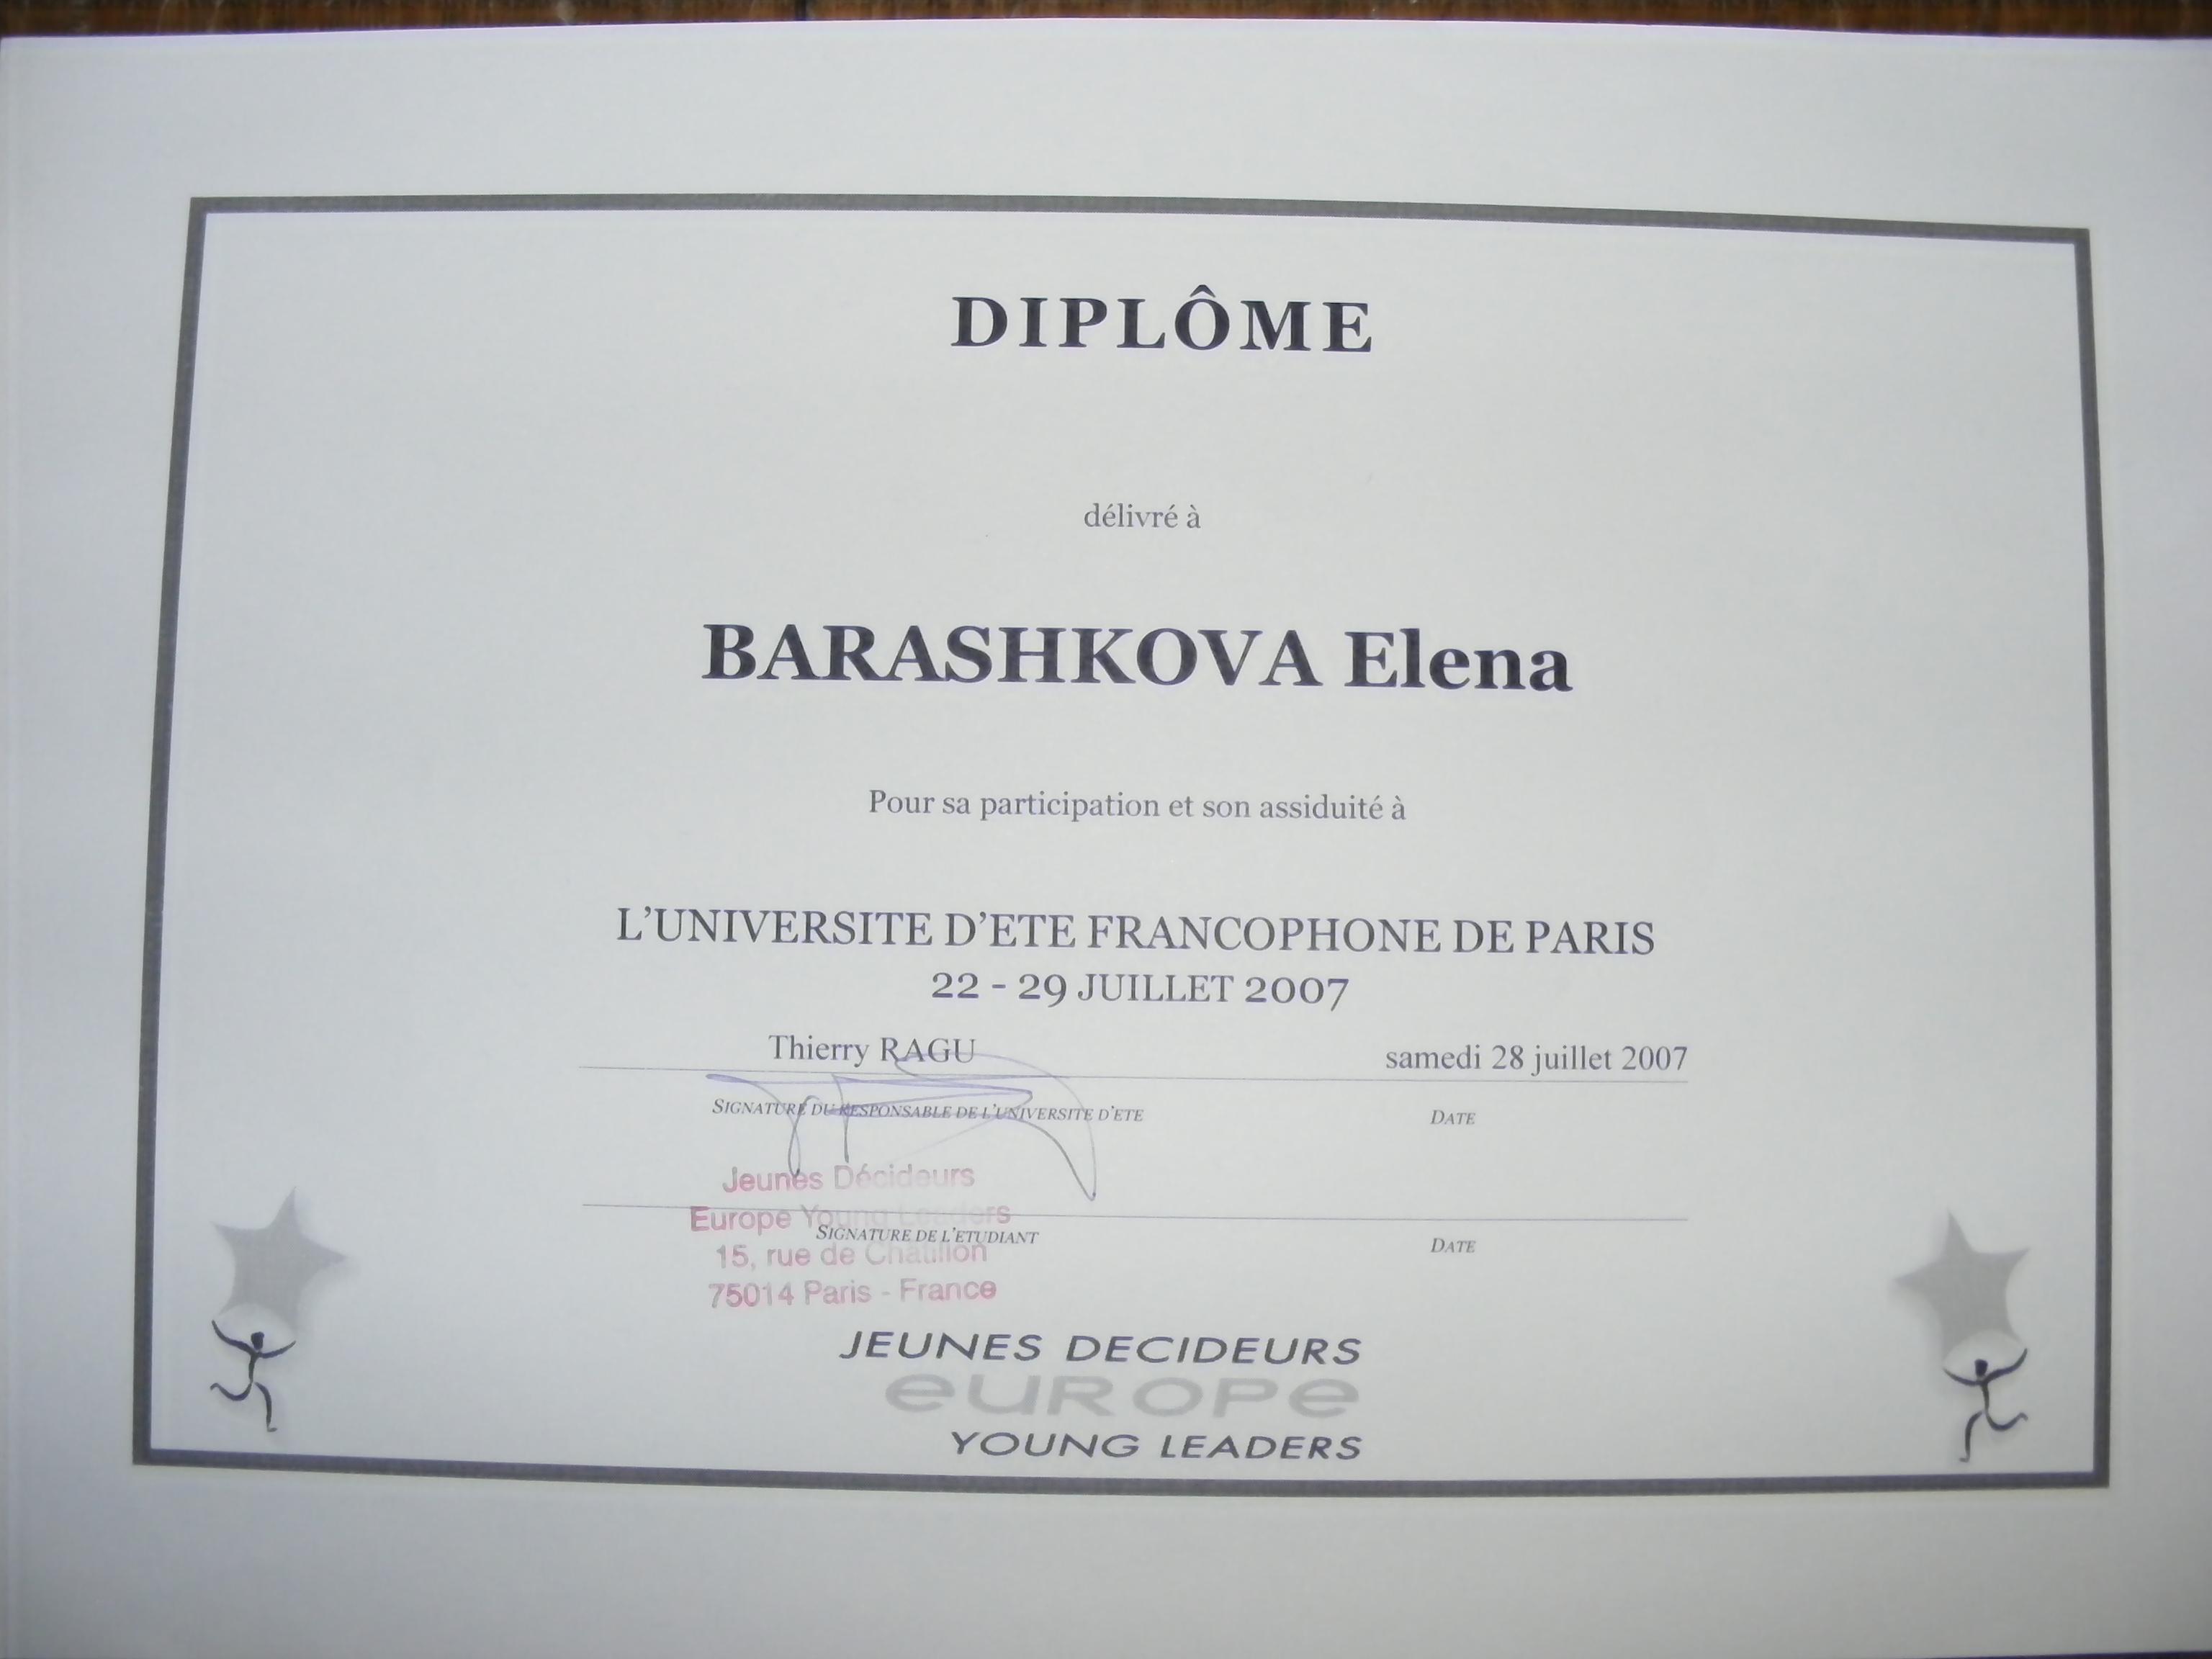 cv elena barashkova